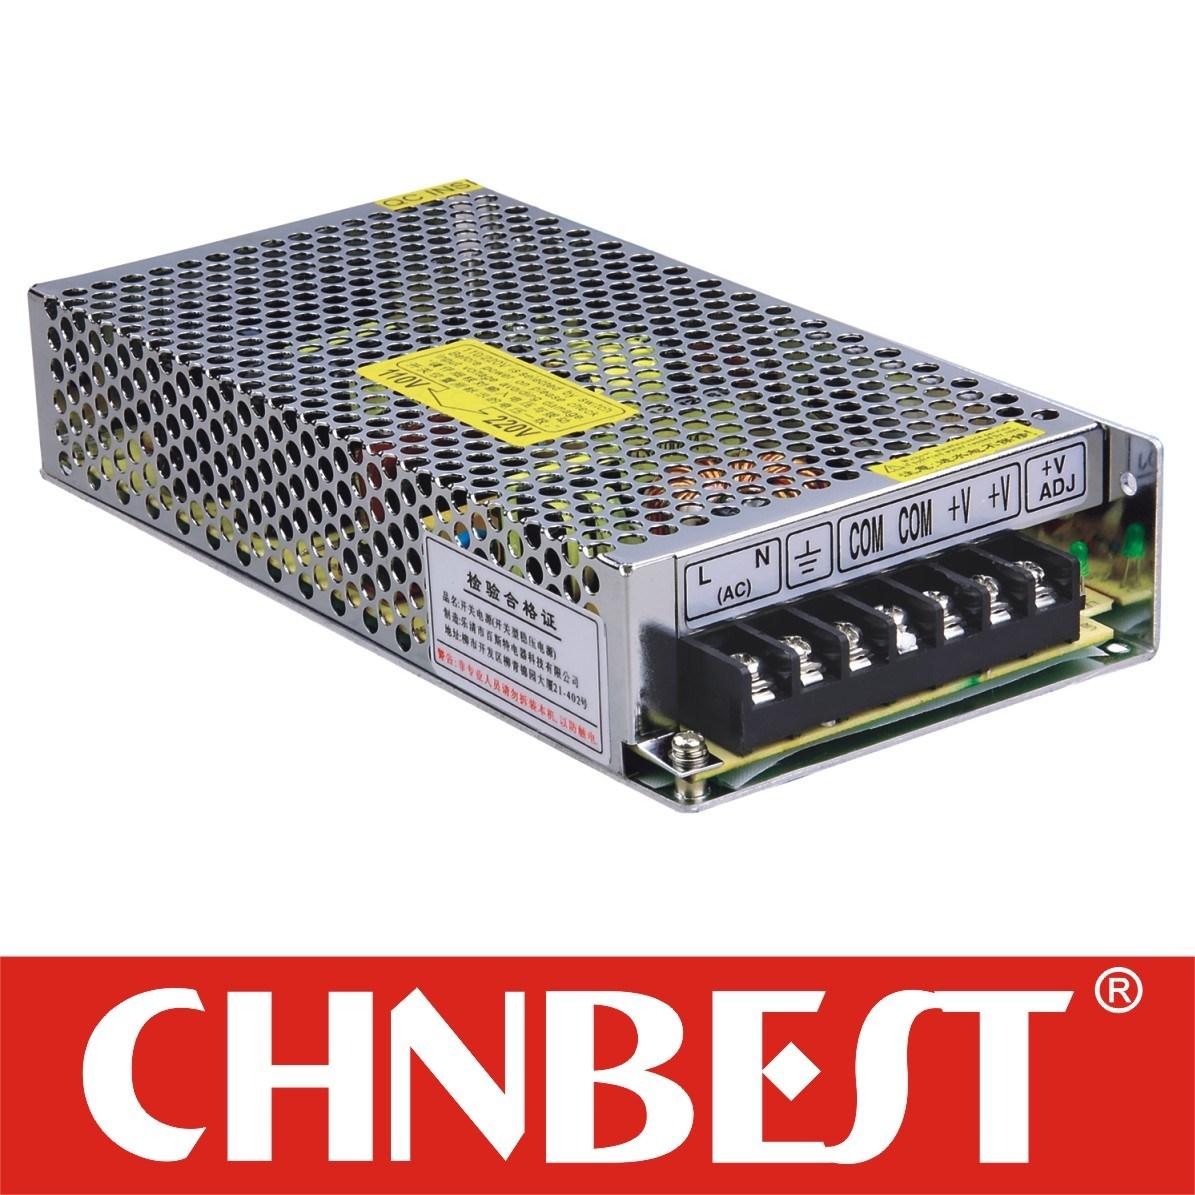 13.5V 145W Single Output Switch Mode Power Supply (S-145-13.5)